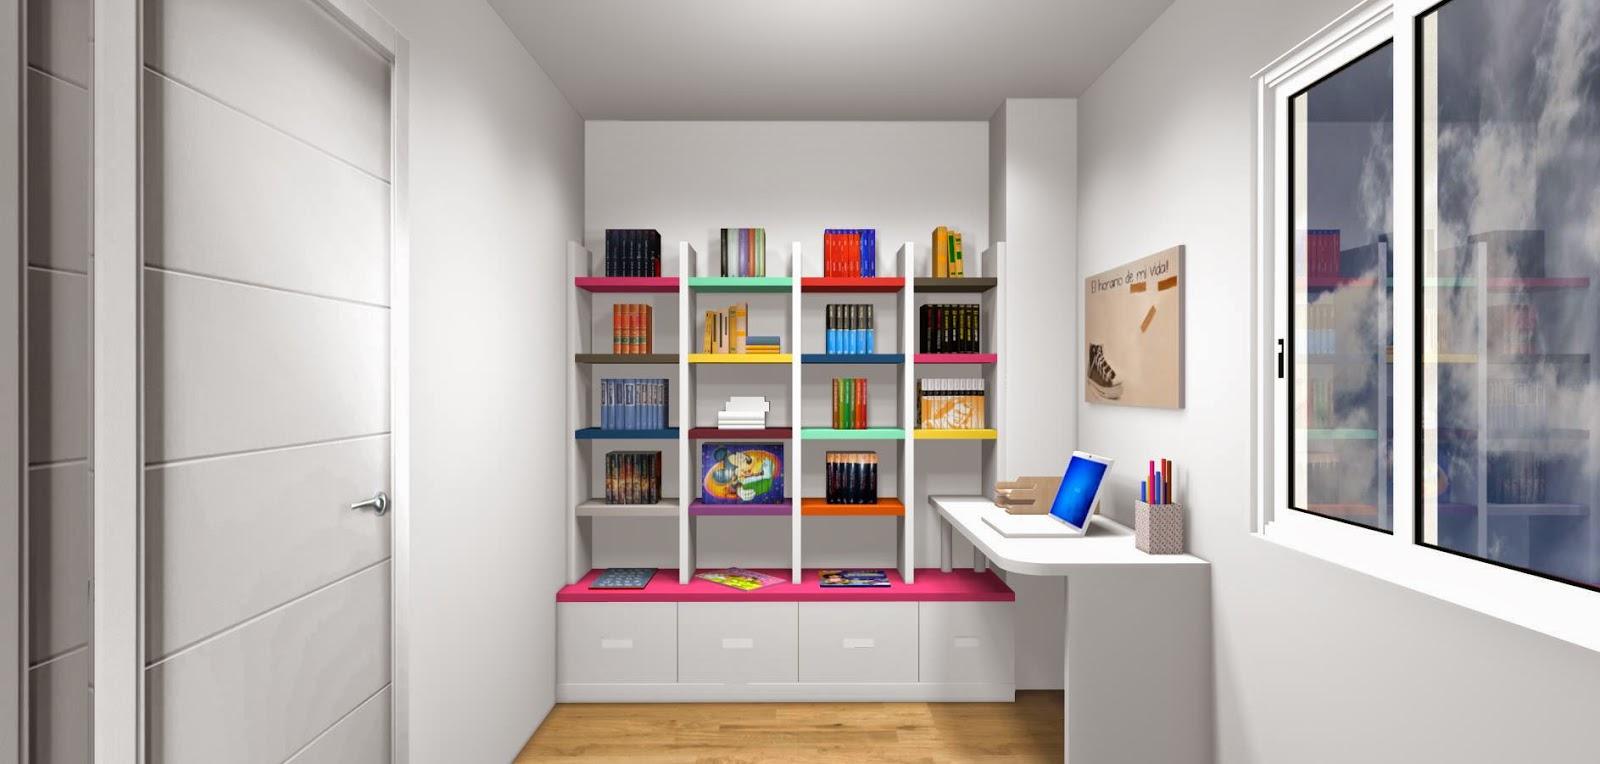 Dise o de cuartos o dormitorios juveniles for Diseno de muebles para cuarto de lavado